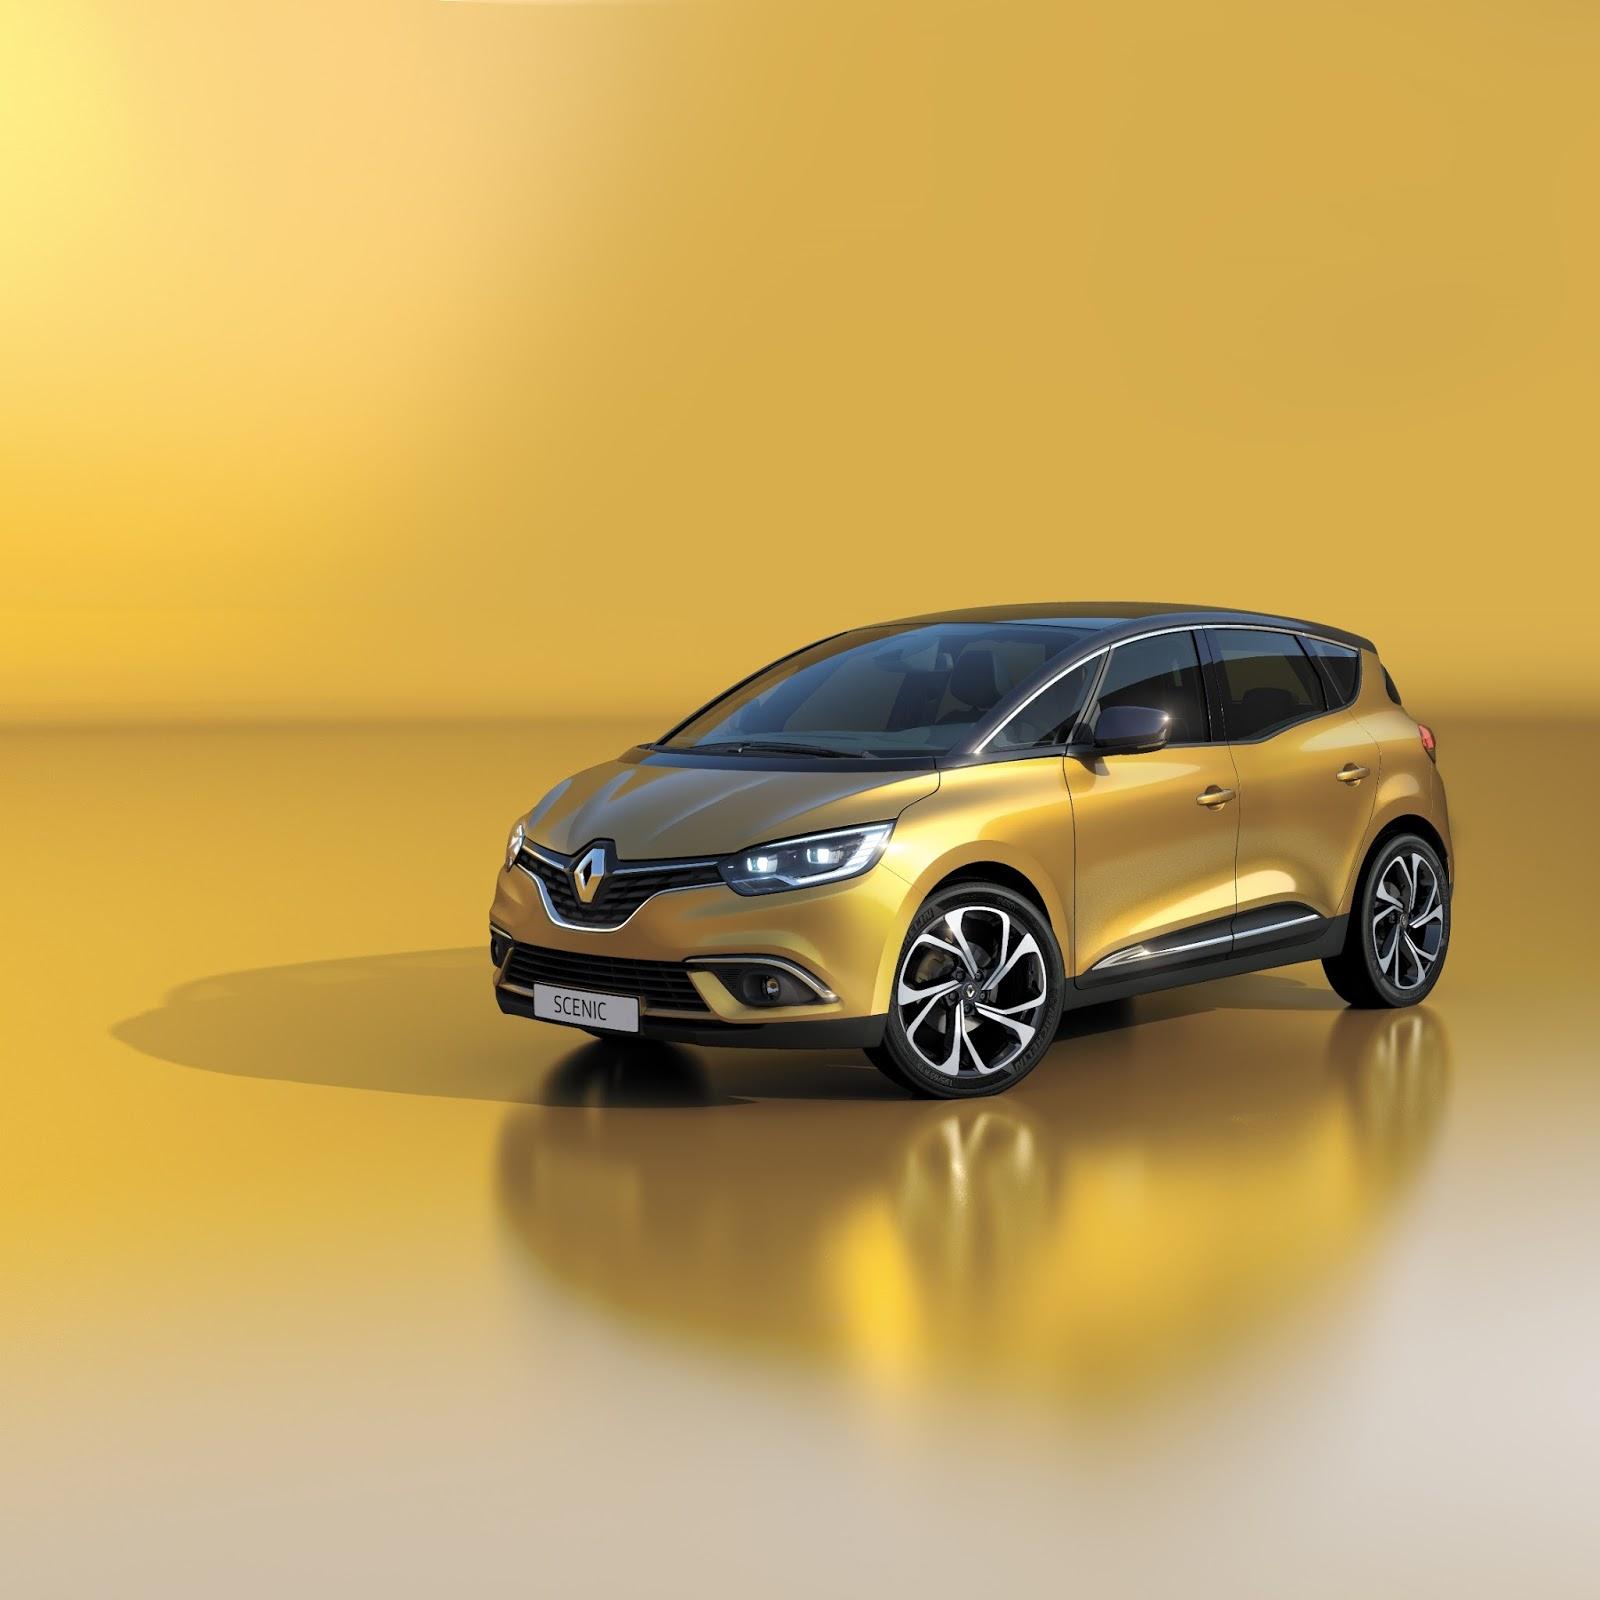 00097376 l Η Renault αποκαλύπτει το νέο Renault Scenic και Renault Megane Estate 86η Έκθεση Γενεύης, autoshow, MPV, Renault, Renault Megane Estate, Renault Scenic, Station Wagon